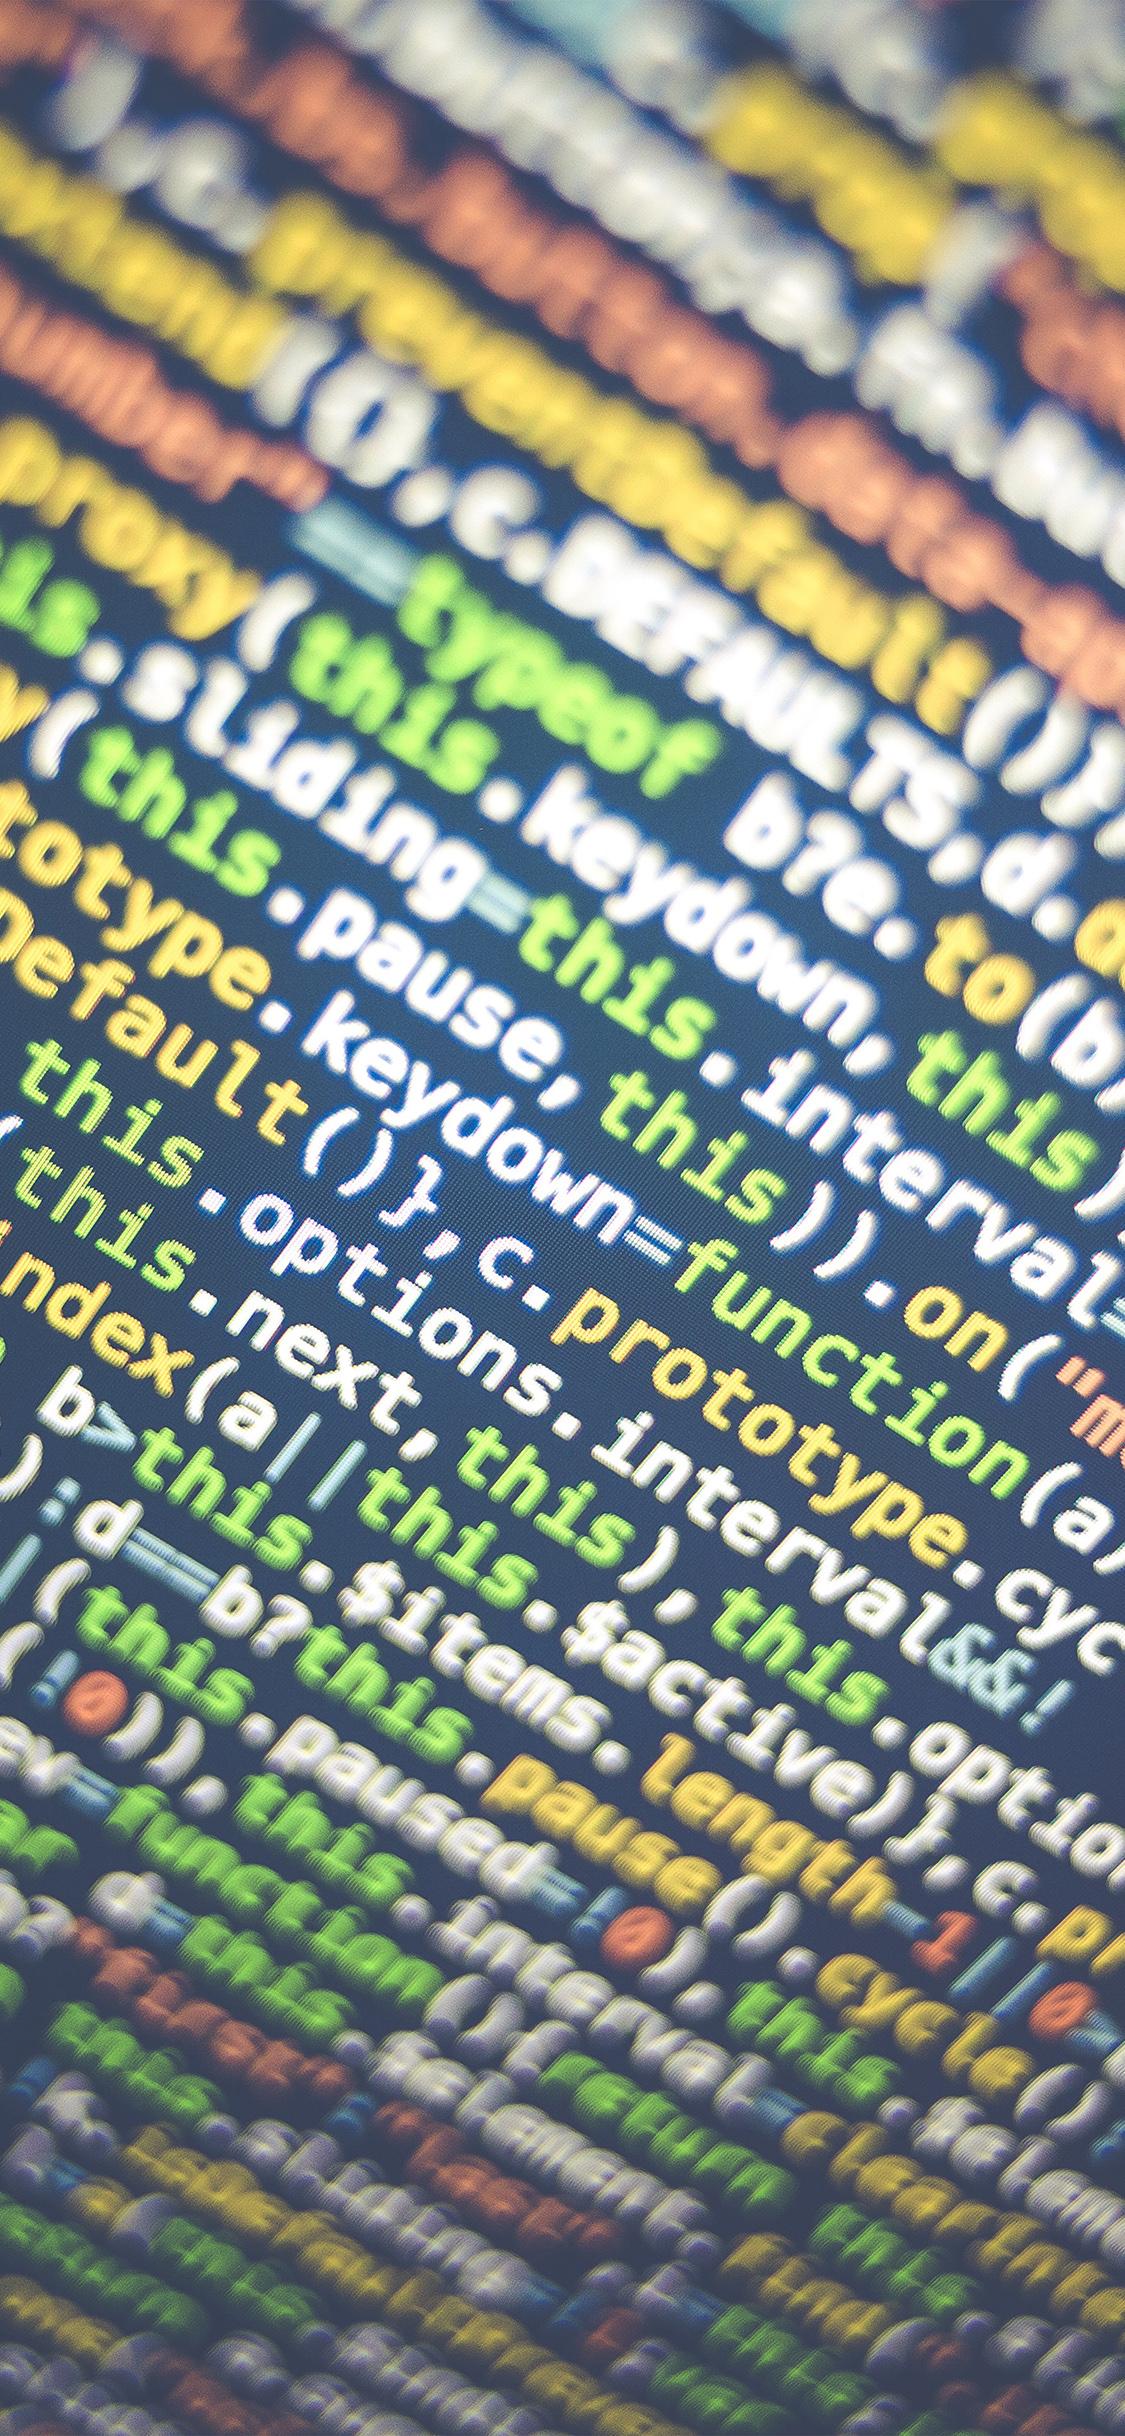 Swift Programming Code Love Typography 5f Jpg